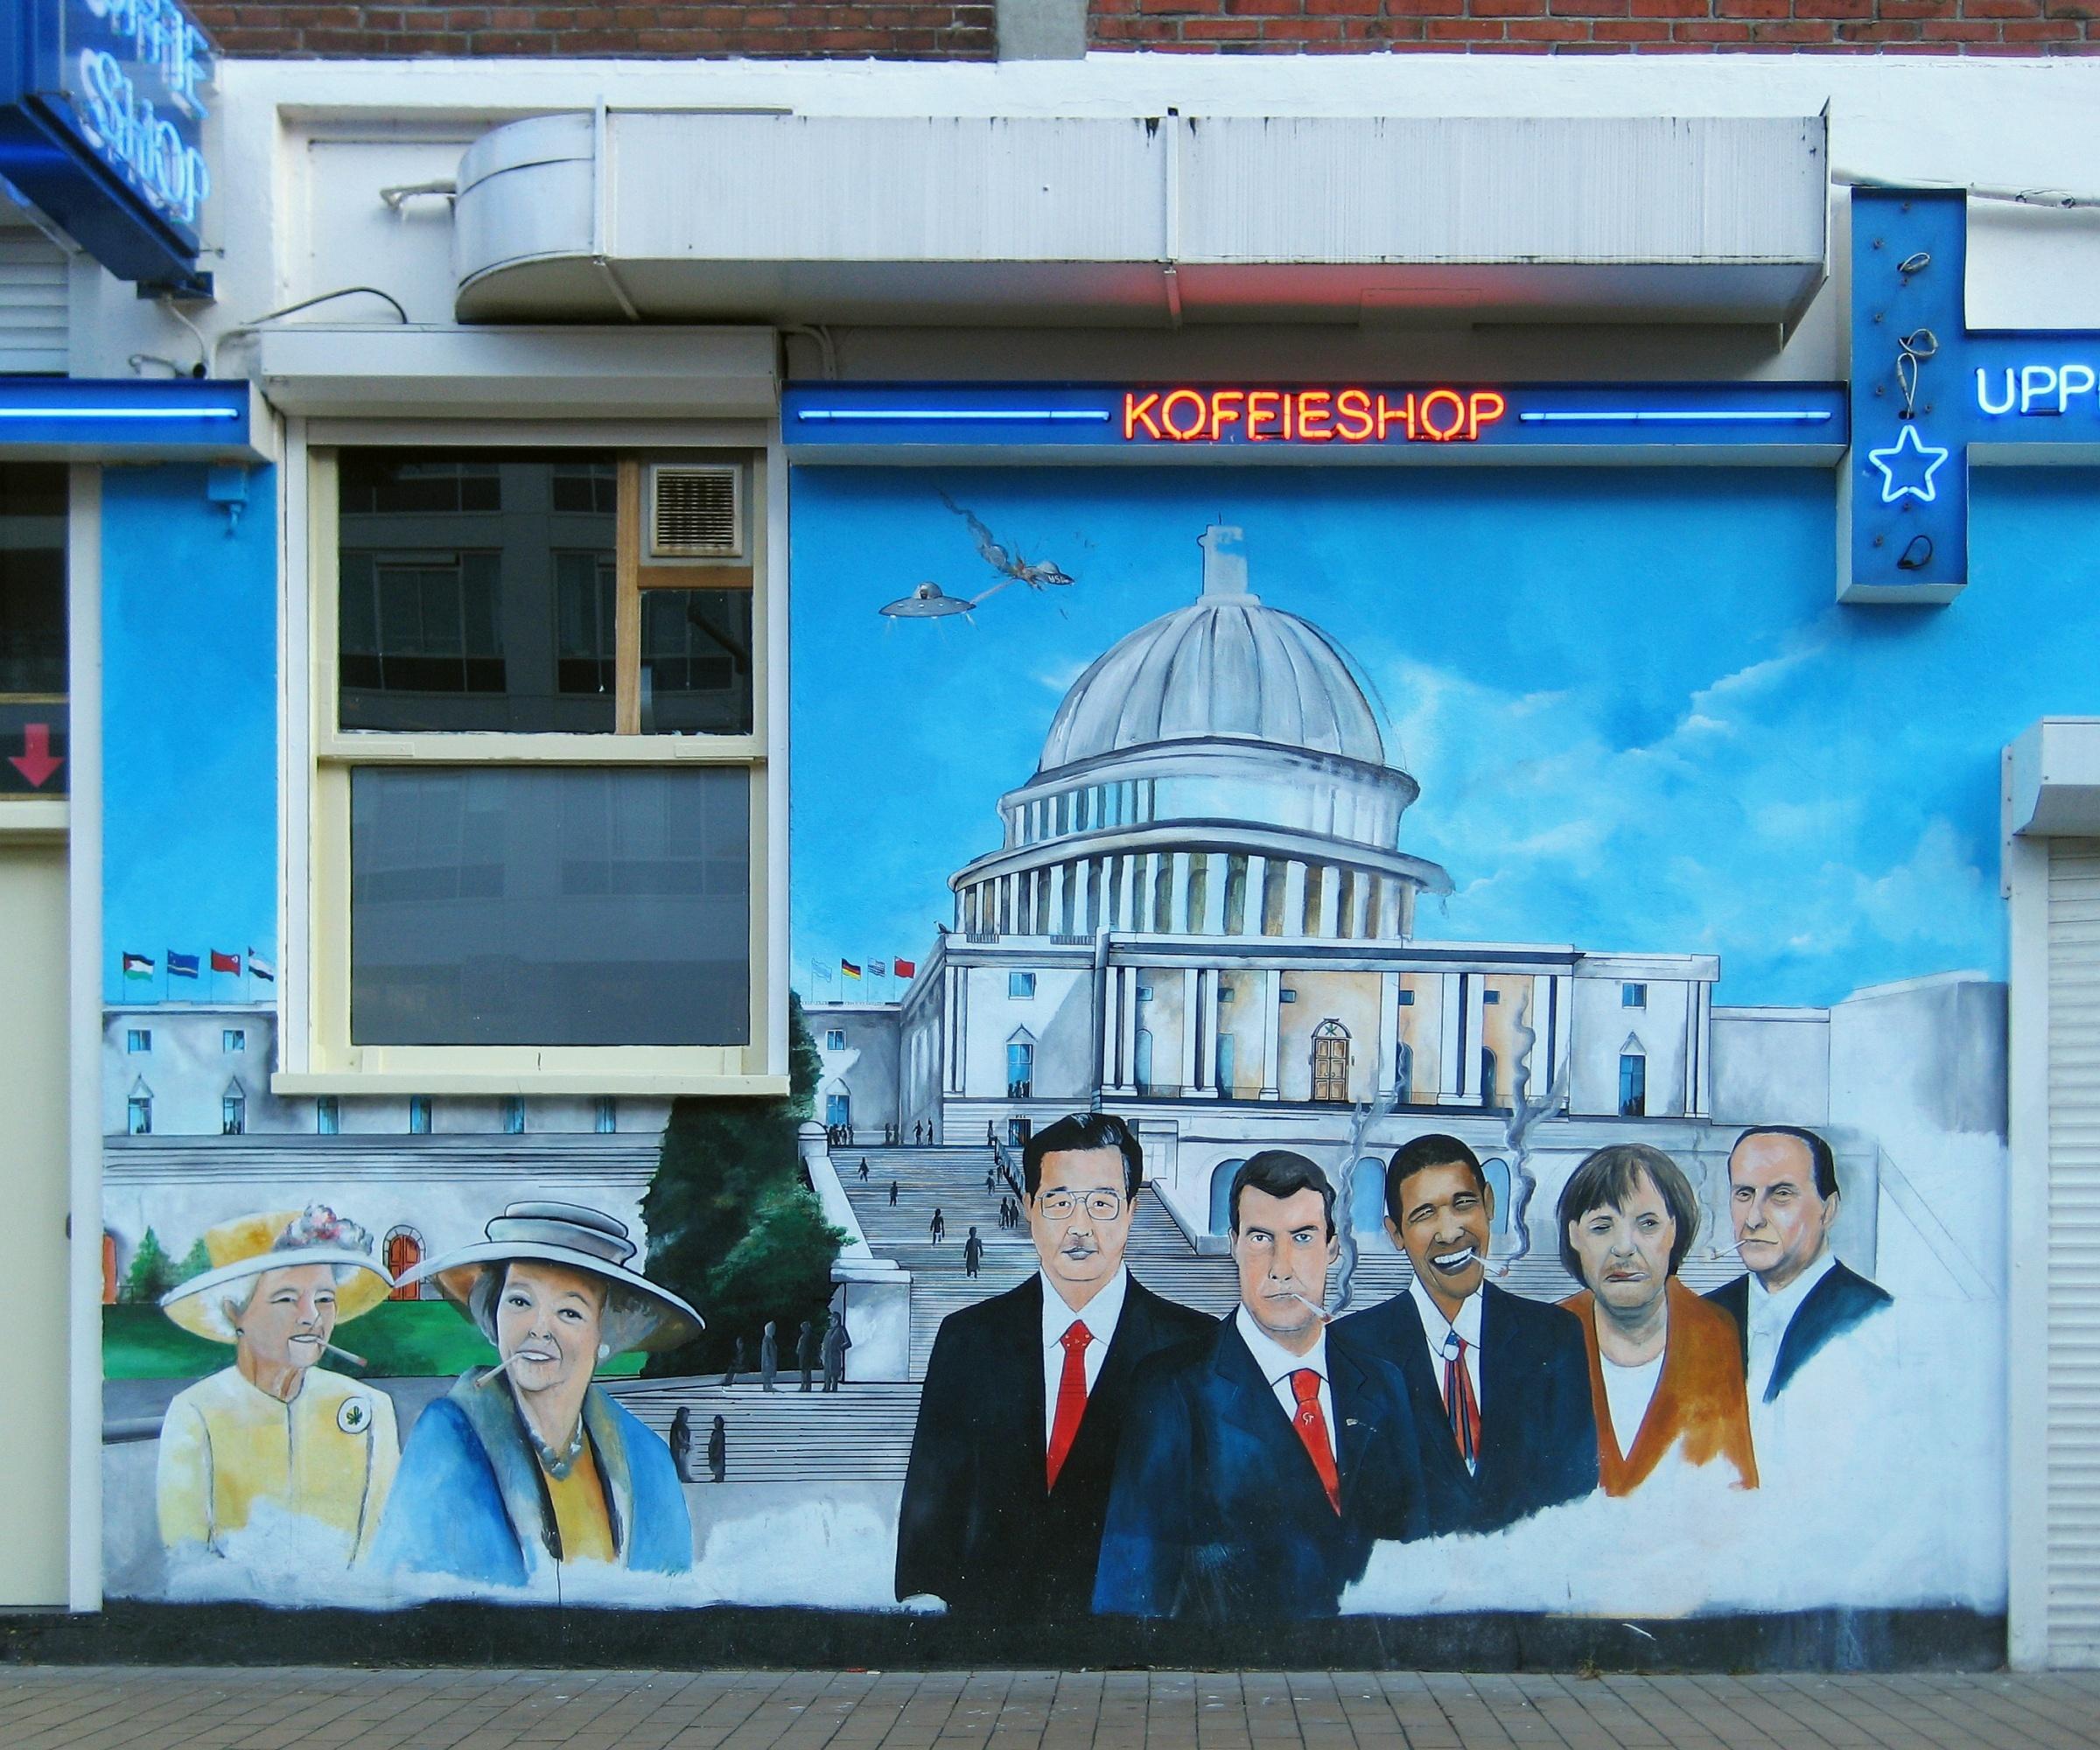 Exterior wall of a coffeeshop in the Dutch city of Groningen. Depicted are Queen Elizabeth II, Queen Beatrix, Hu Jintao, Dmitry Medvedev, Barack Obama, ...